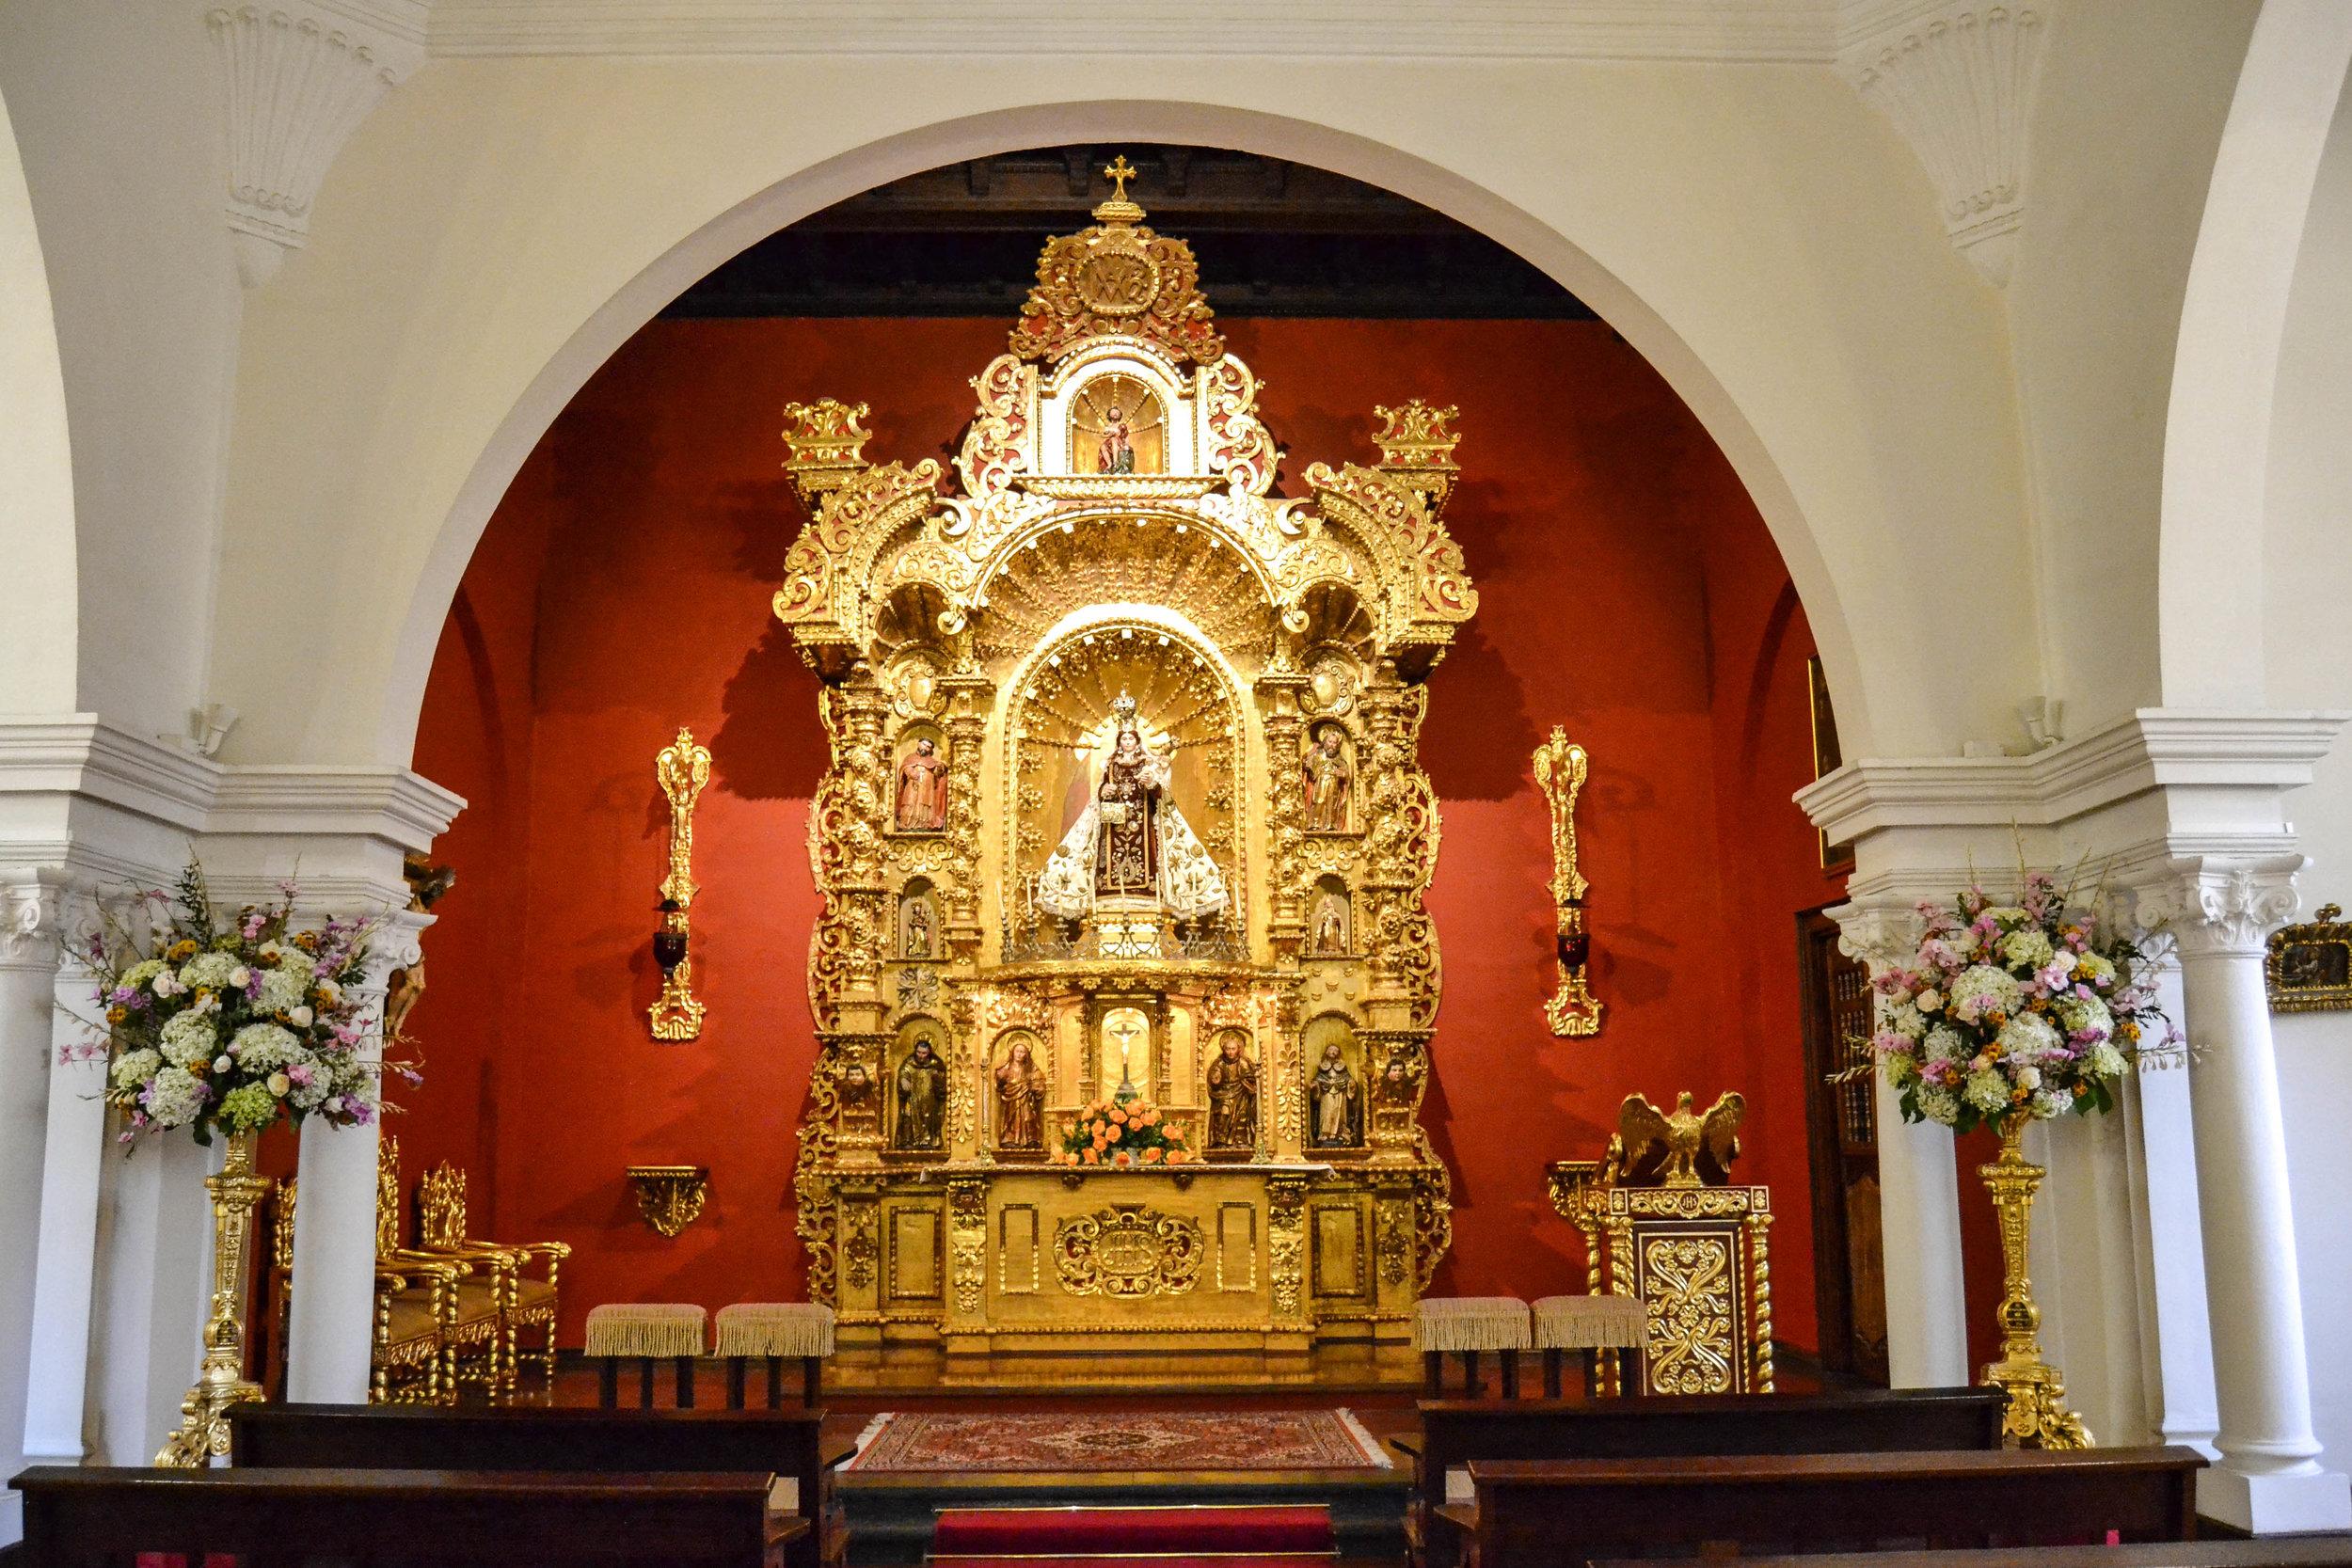 Archbishop Palace Altar.jpg